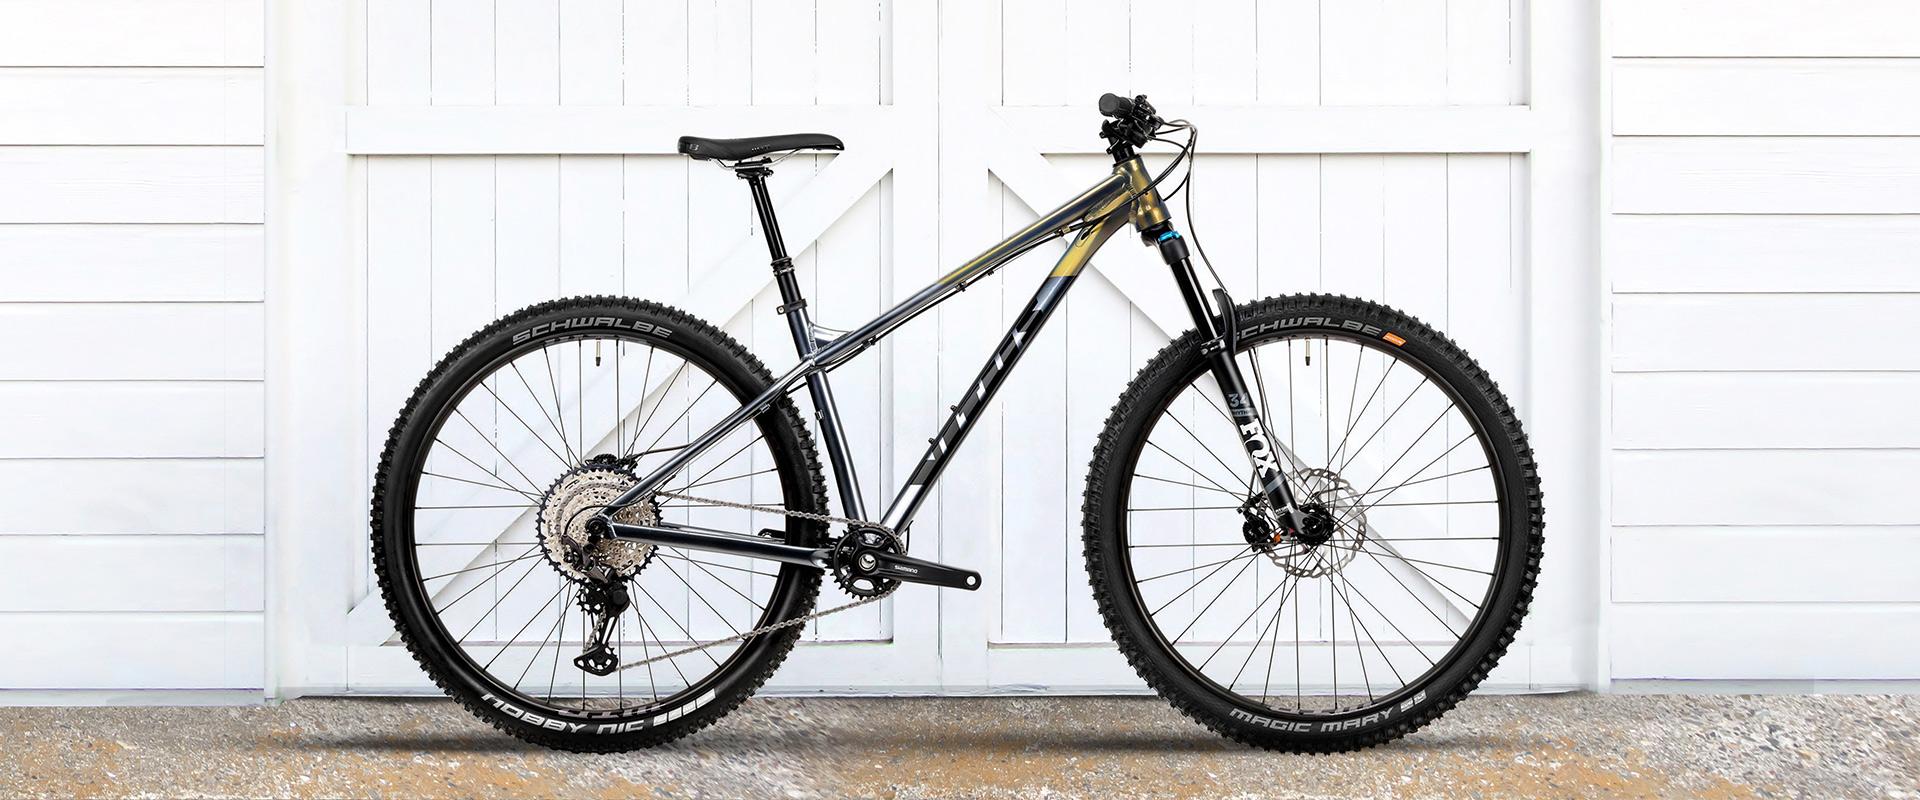 Sentier 27 VRX Bike XT SLX 1x12